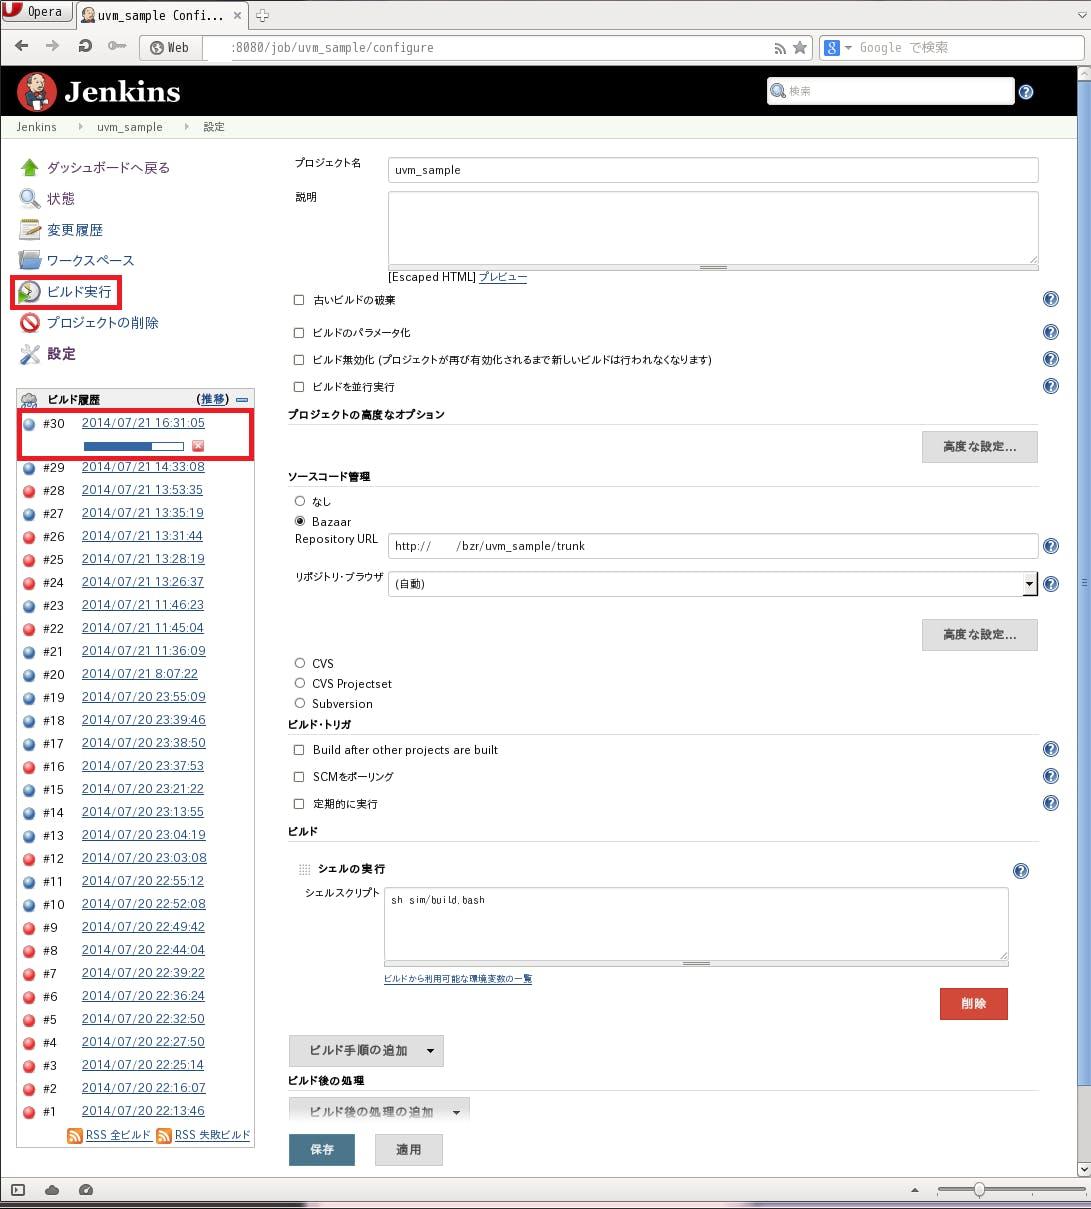 SystemVerilog]Jenkinsを利用したUVMテスト環境の構築 - Qiita